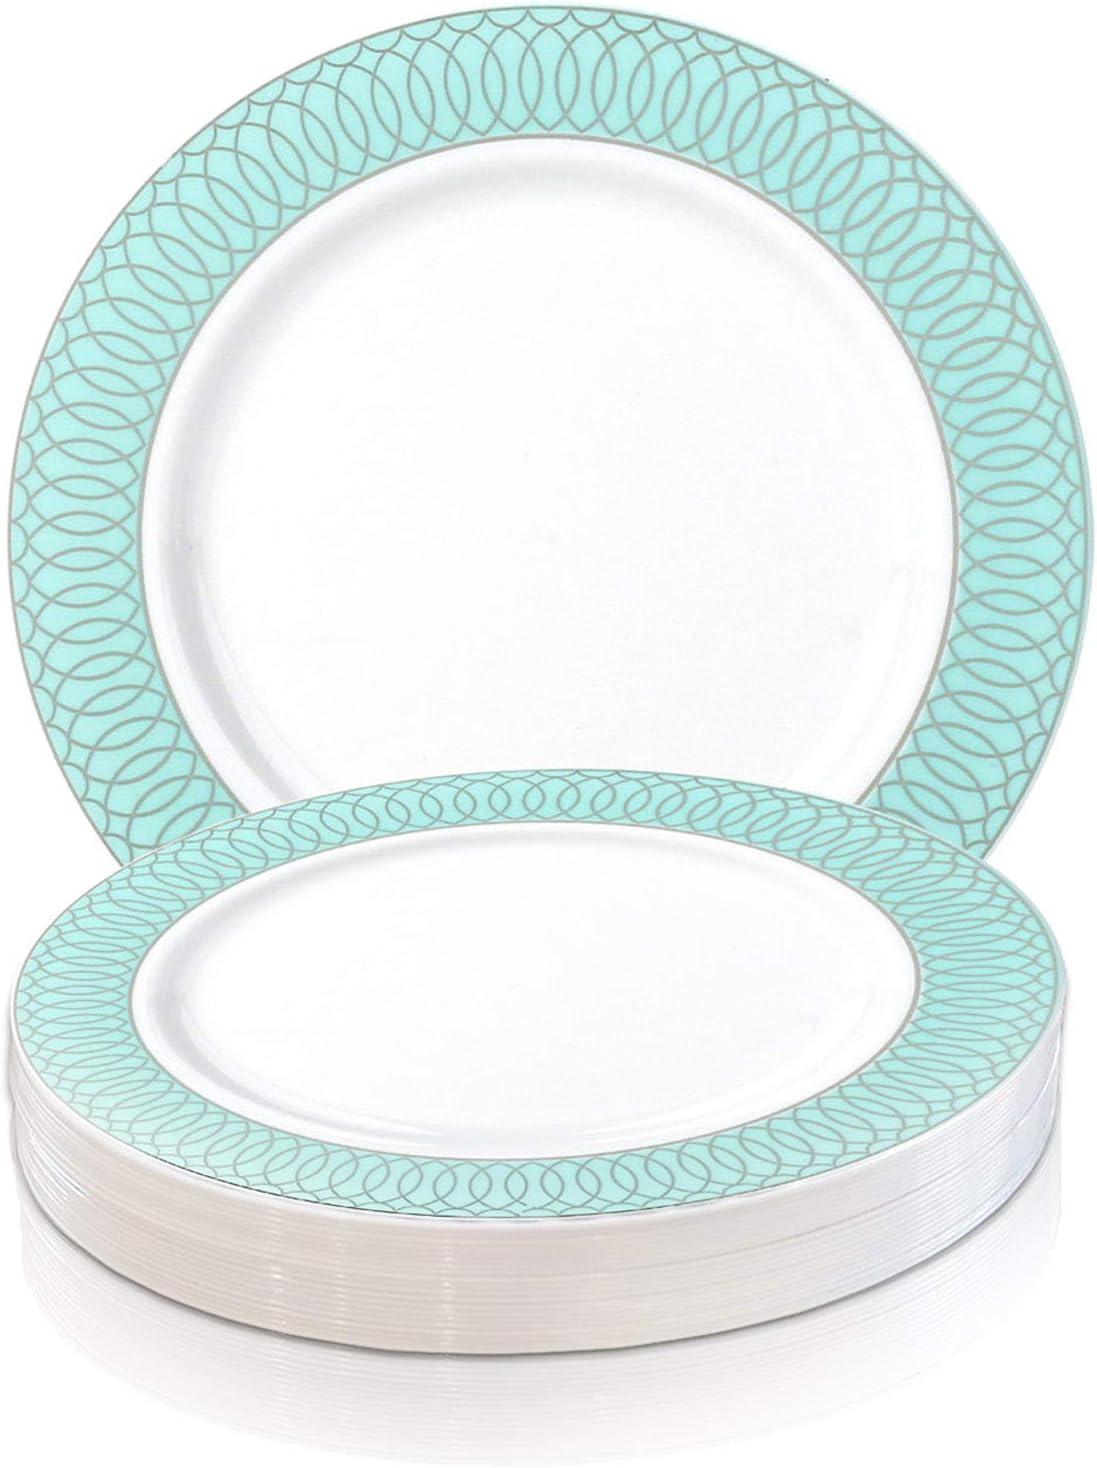 Elegant Disposable Plastic Dinner SALE 絶品 Plates Pcs - Heavy 10.25